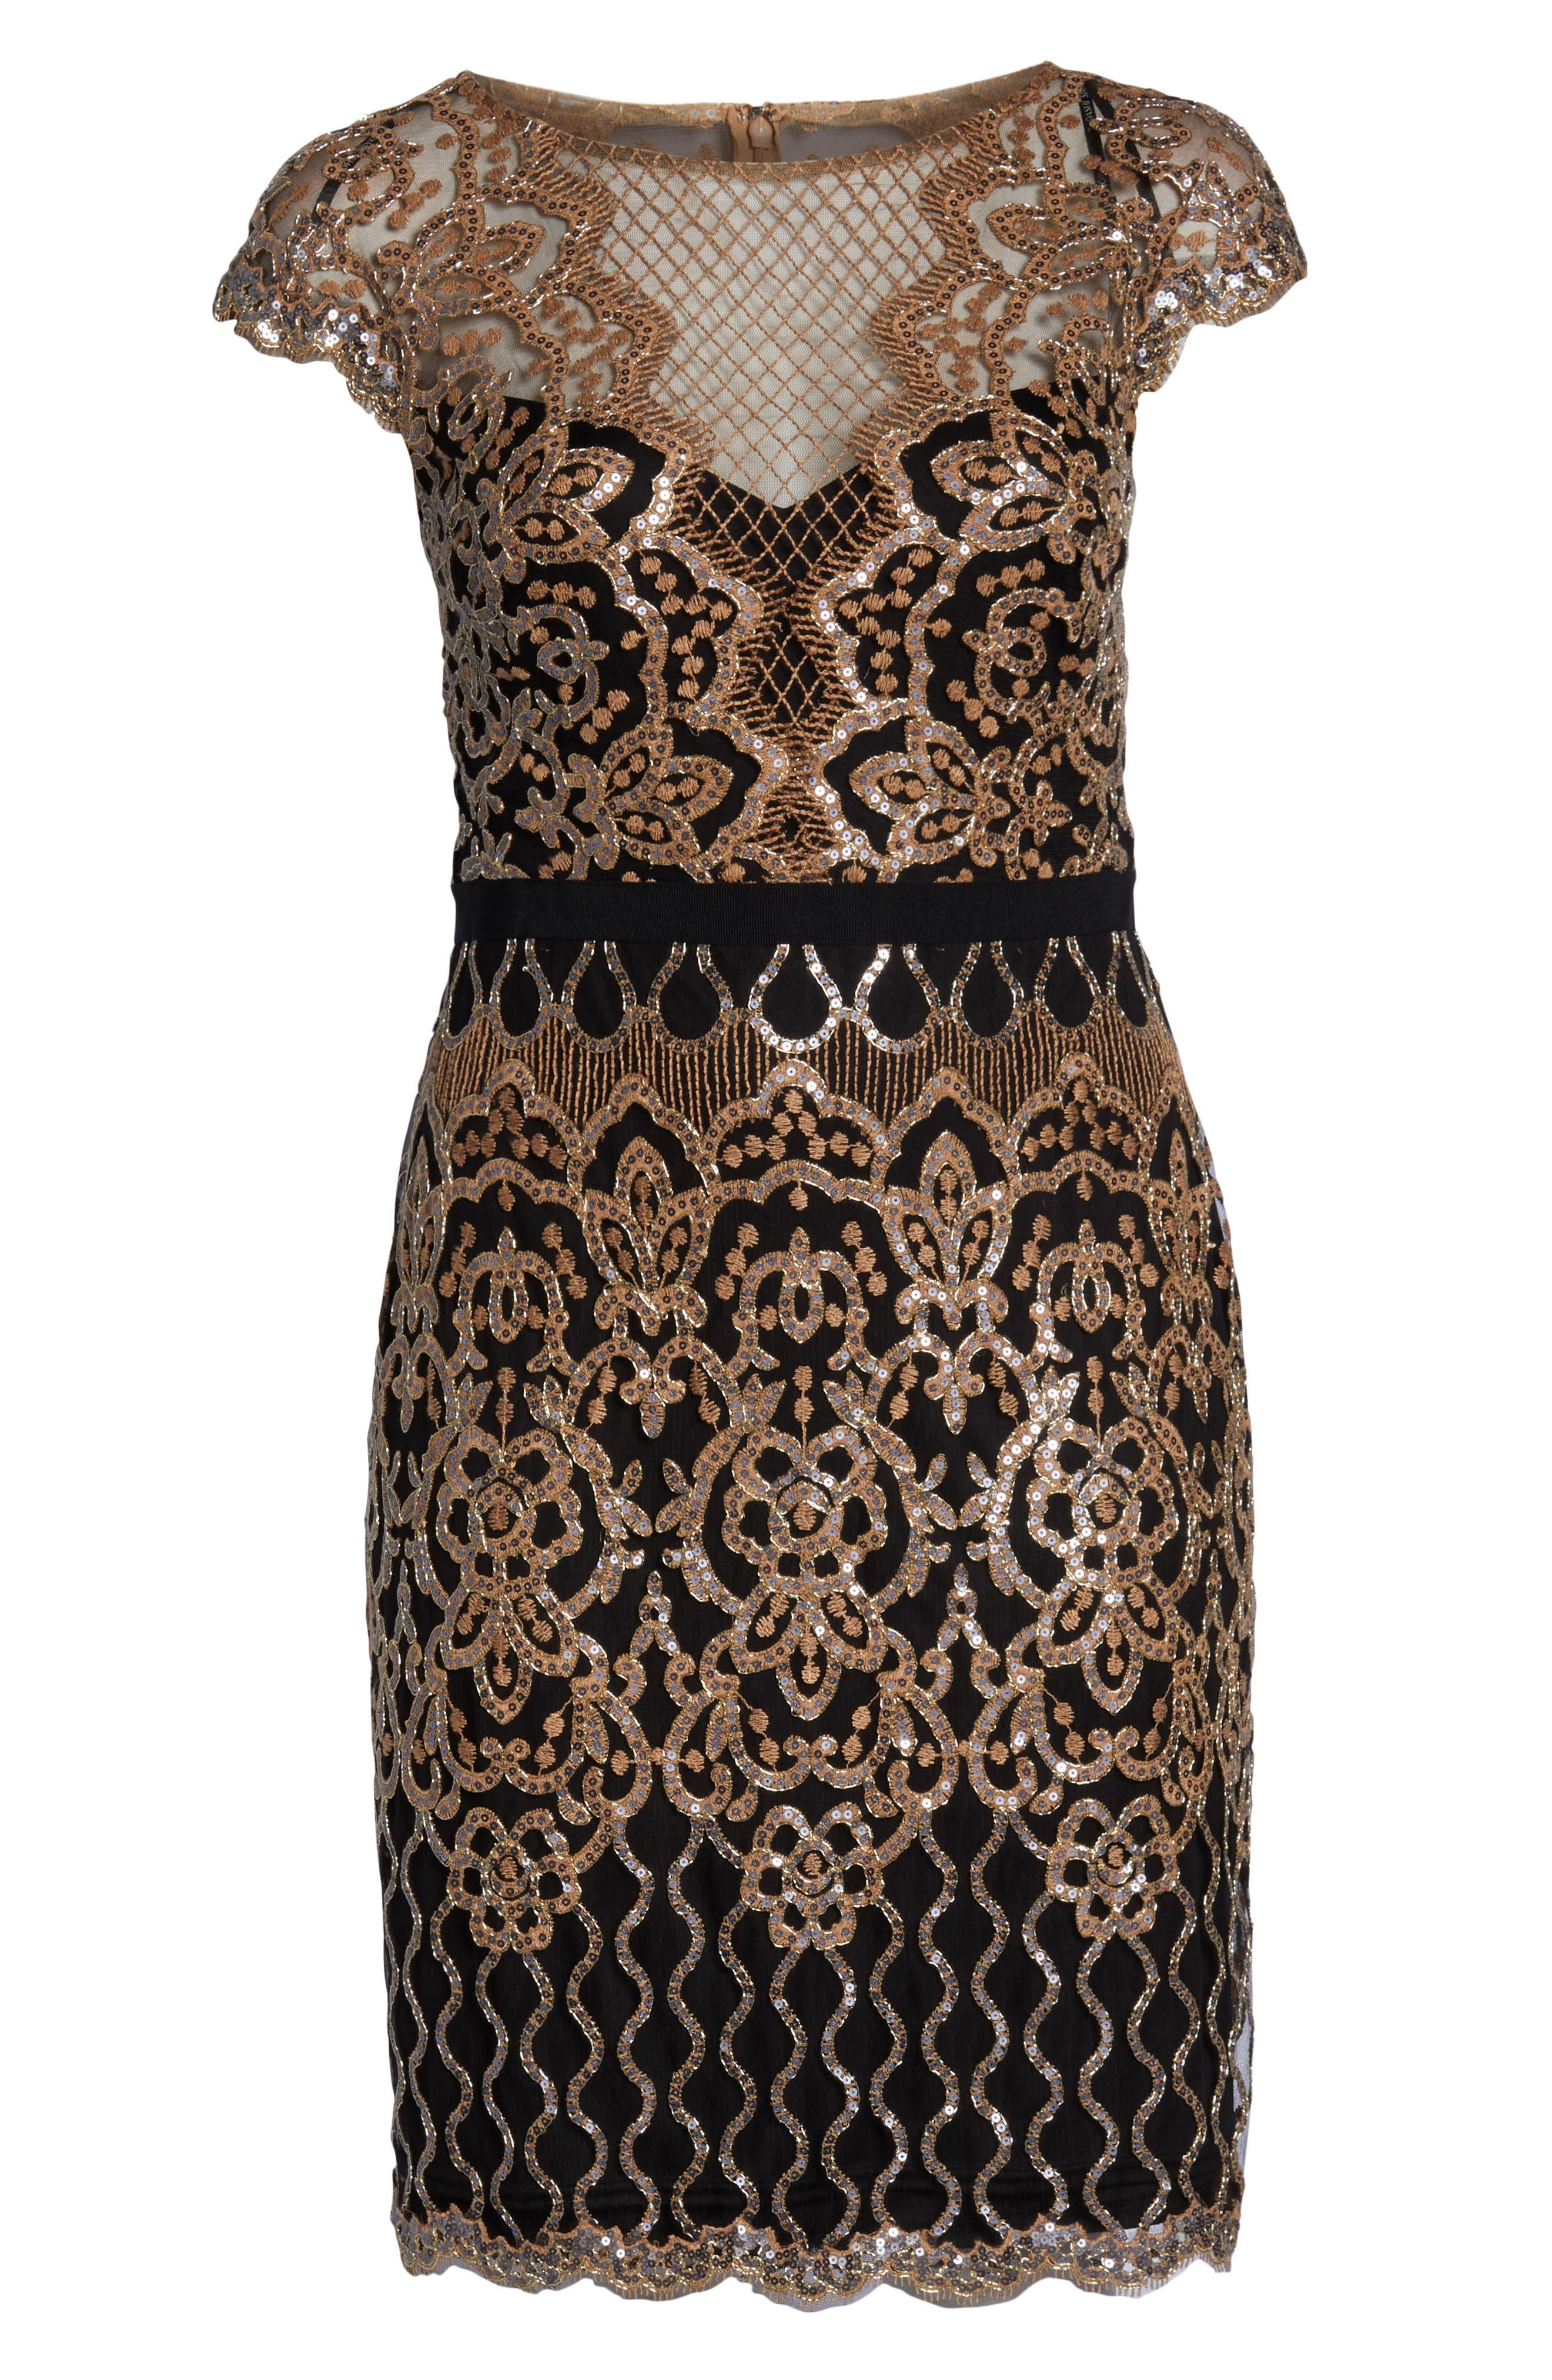 Sequin Embellished Dress,                             Alternate thumbnail 13, color,                             COPPER SHADOW/ BLACK